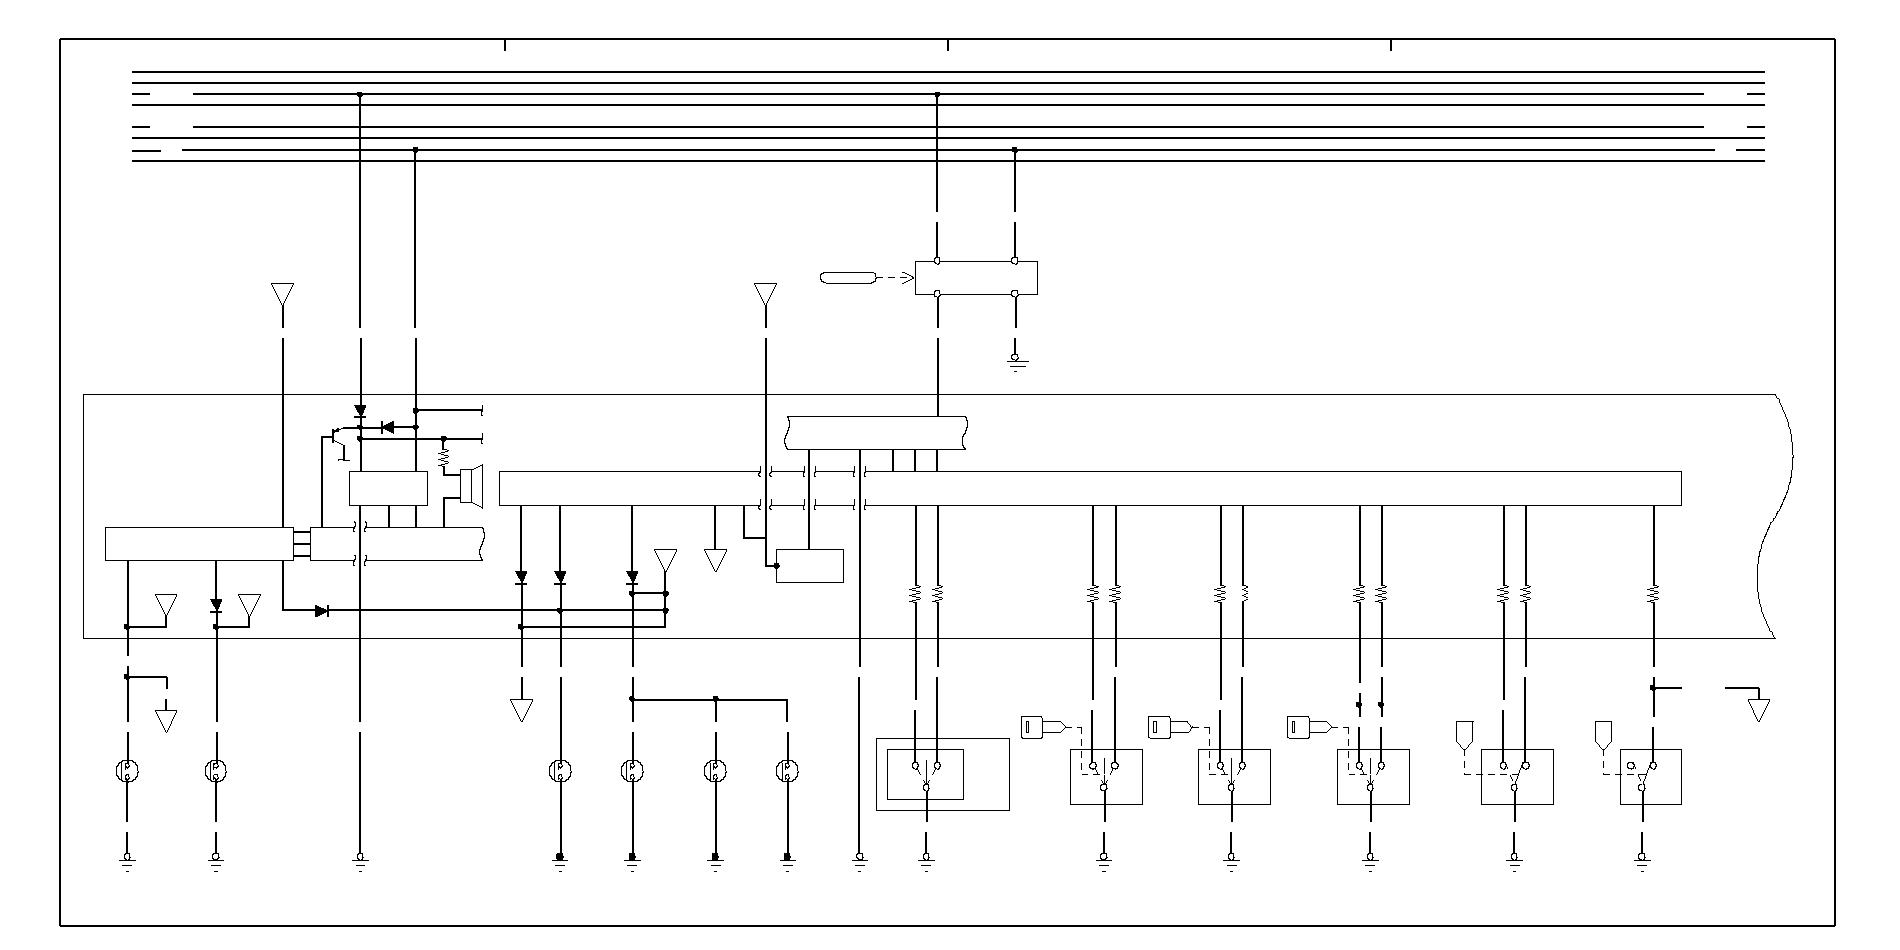 Wiring Diagram For Honda Jazz : Honda jazz wiring diagram manual torzone org auto